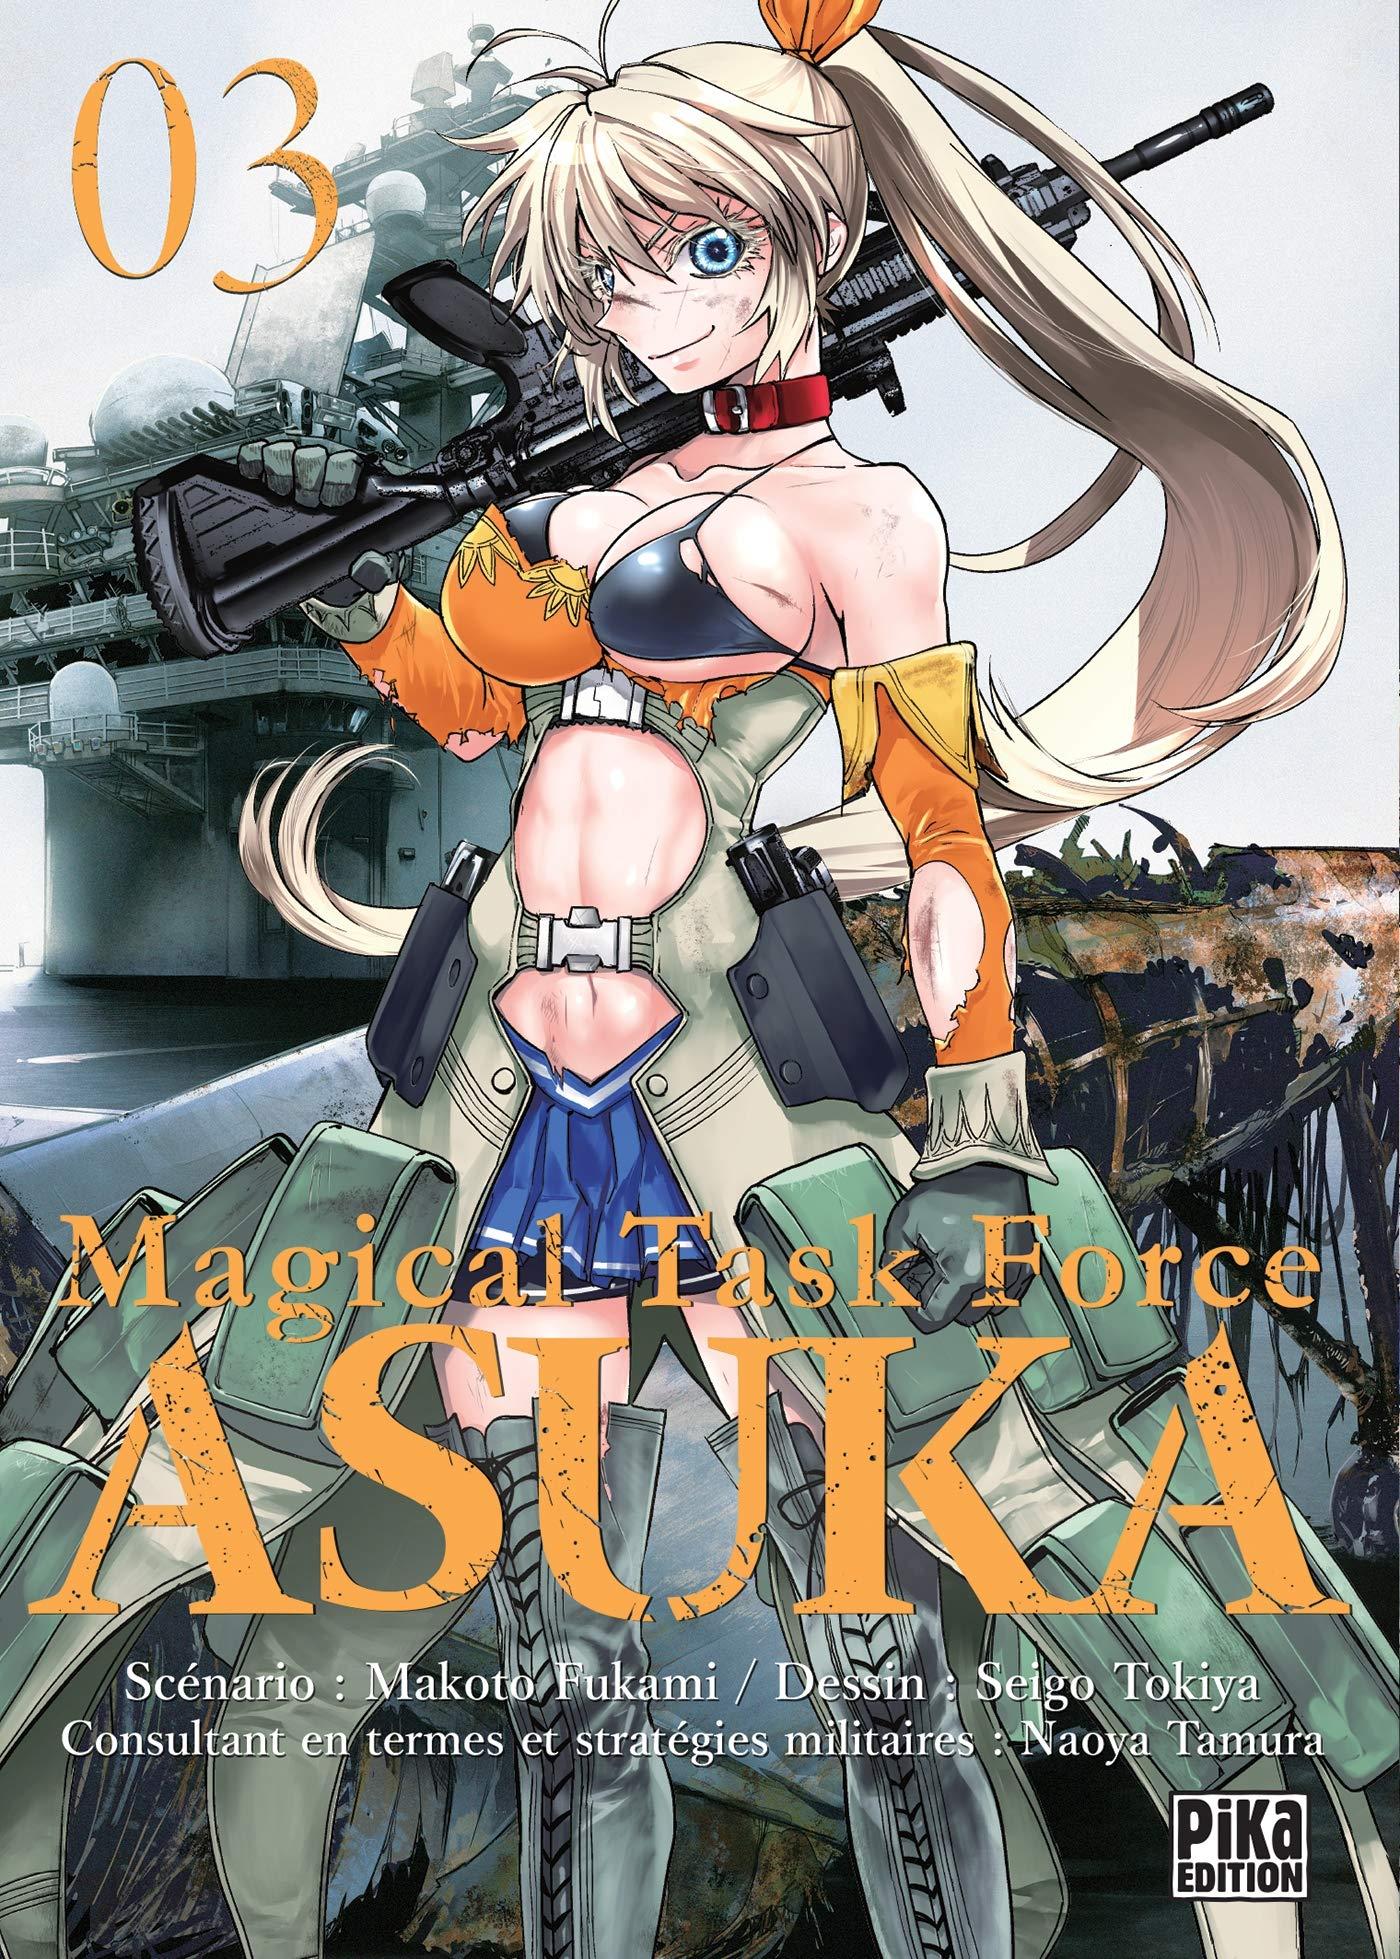 Magical task force Asuka 3